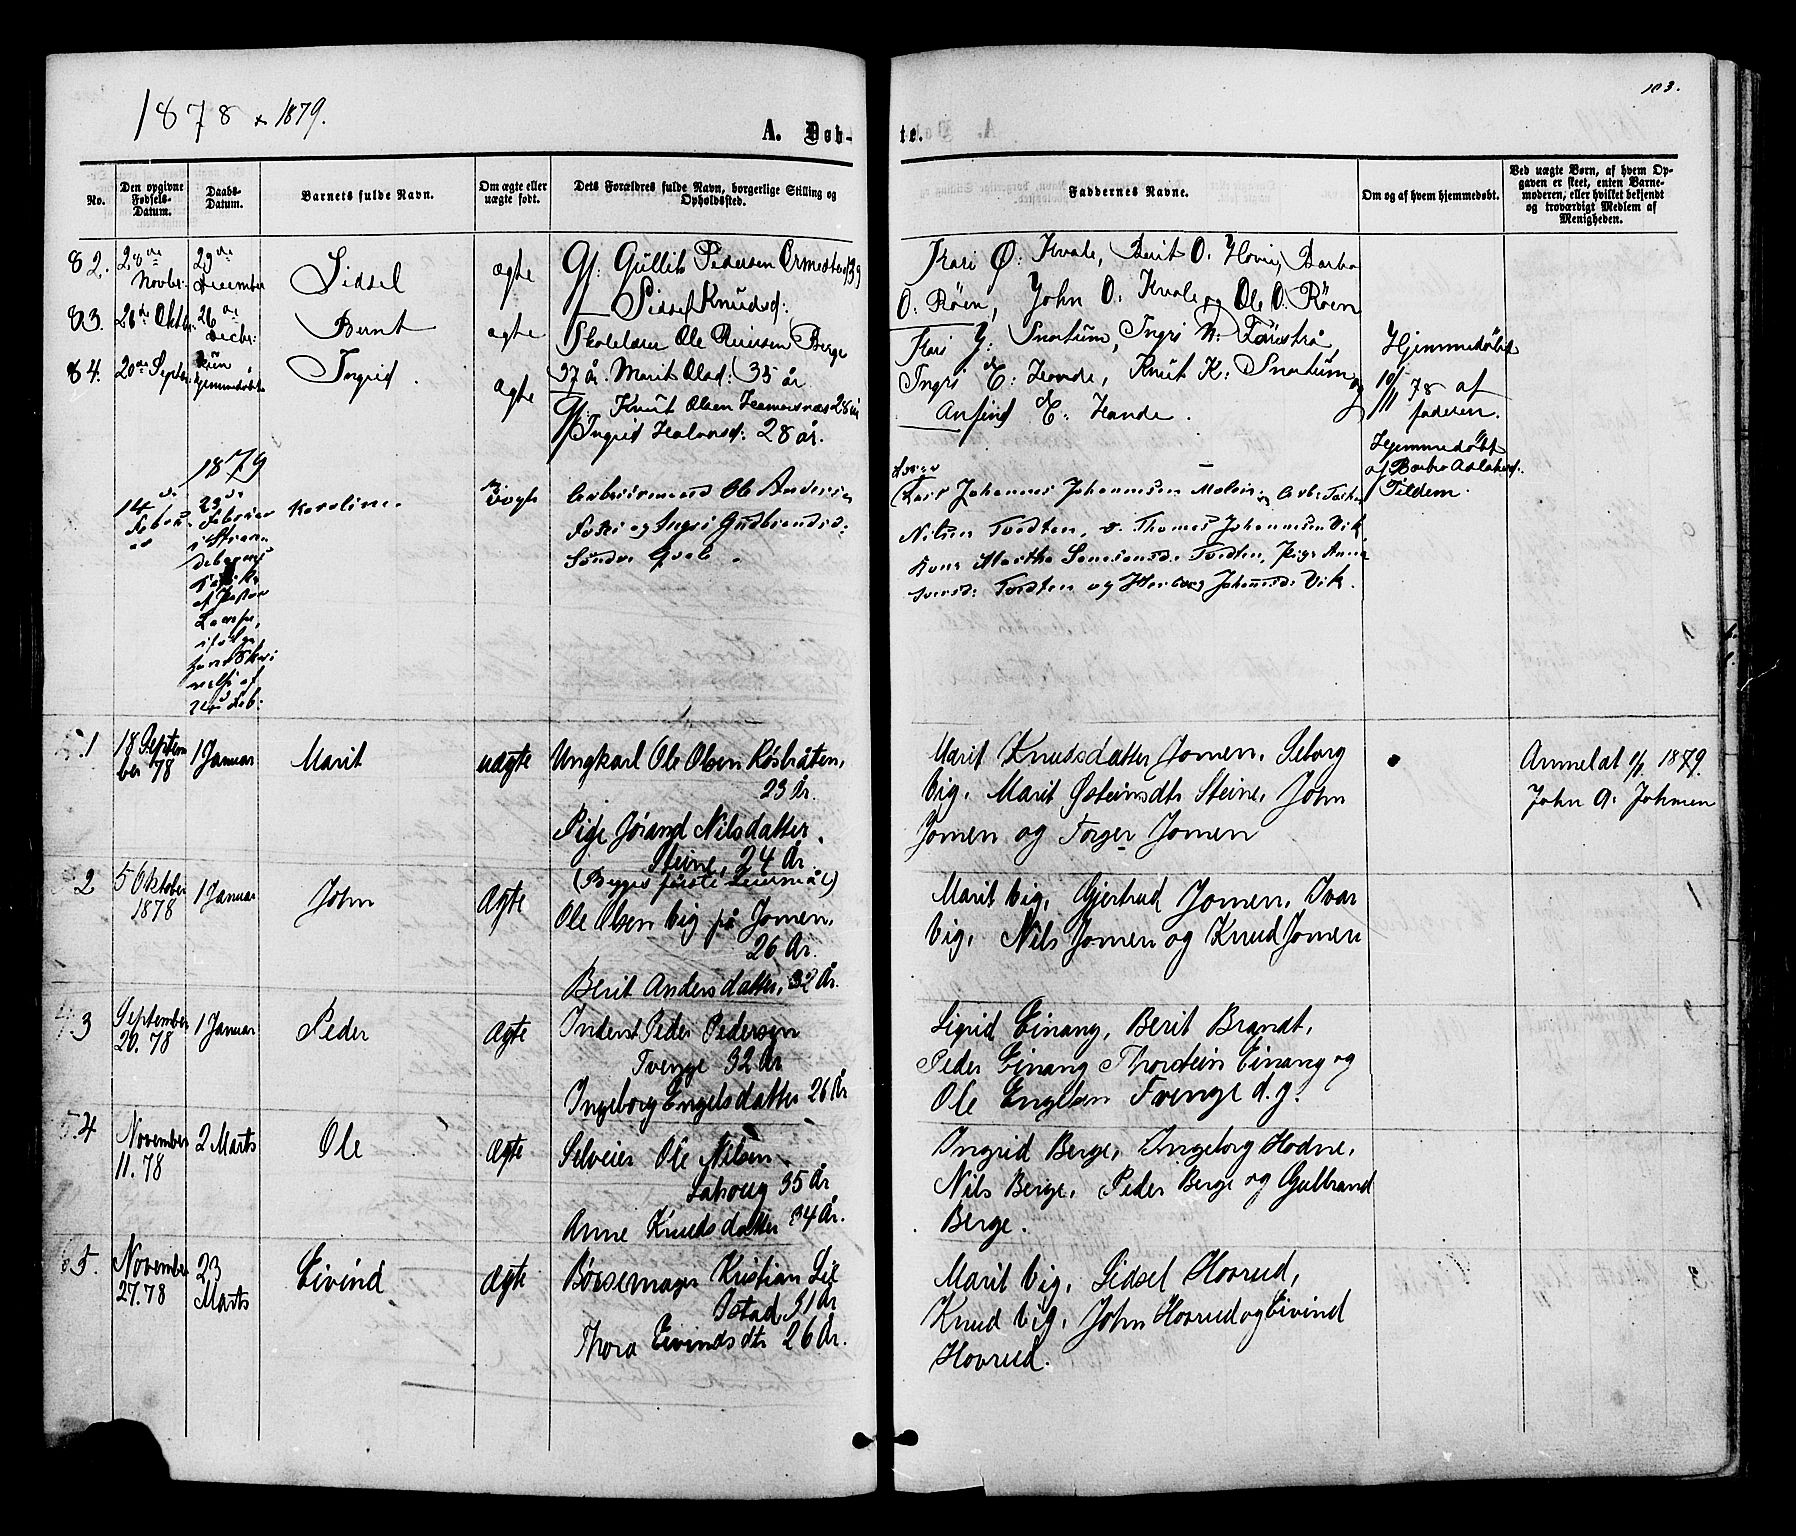 SAH, Vestre Slidre prestekontor, Ministerialbok nr. 3, 1865-1880, s. 103